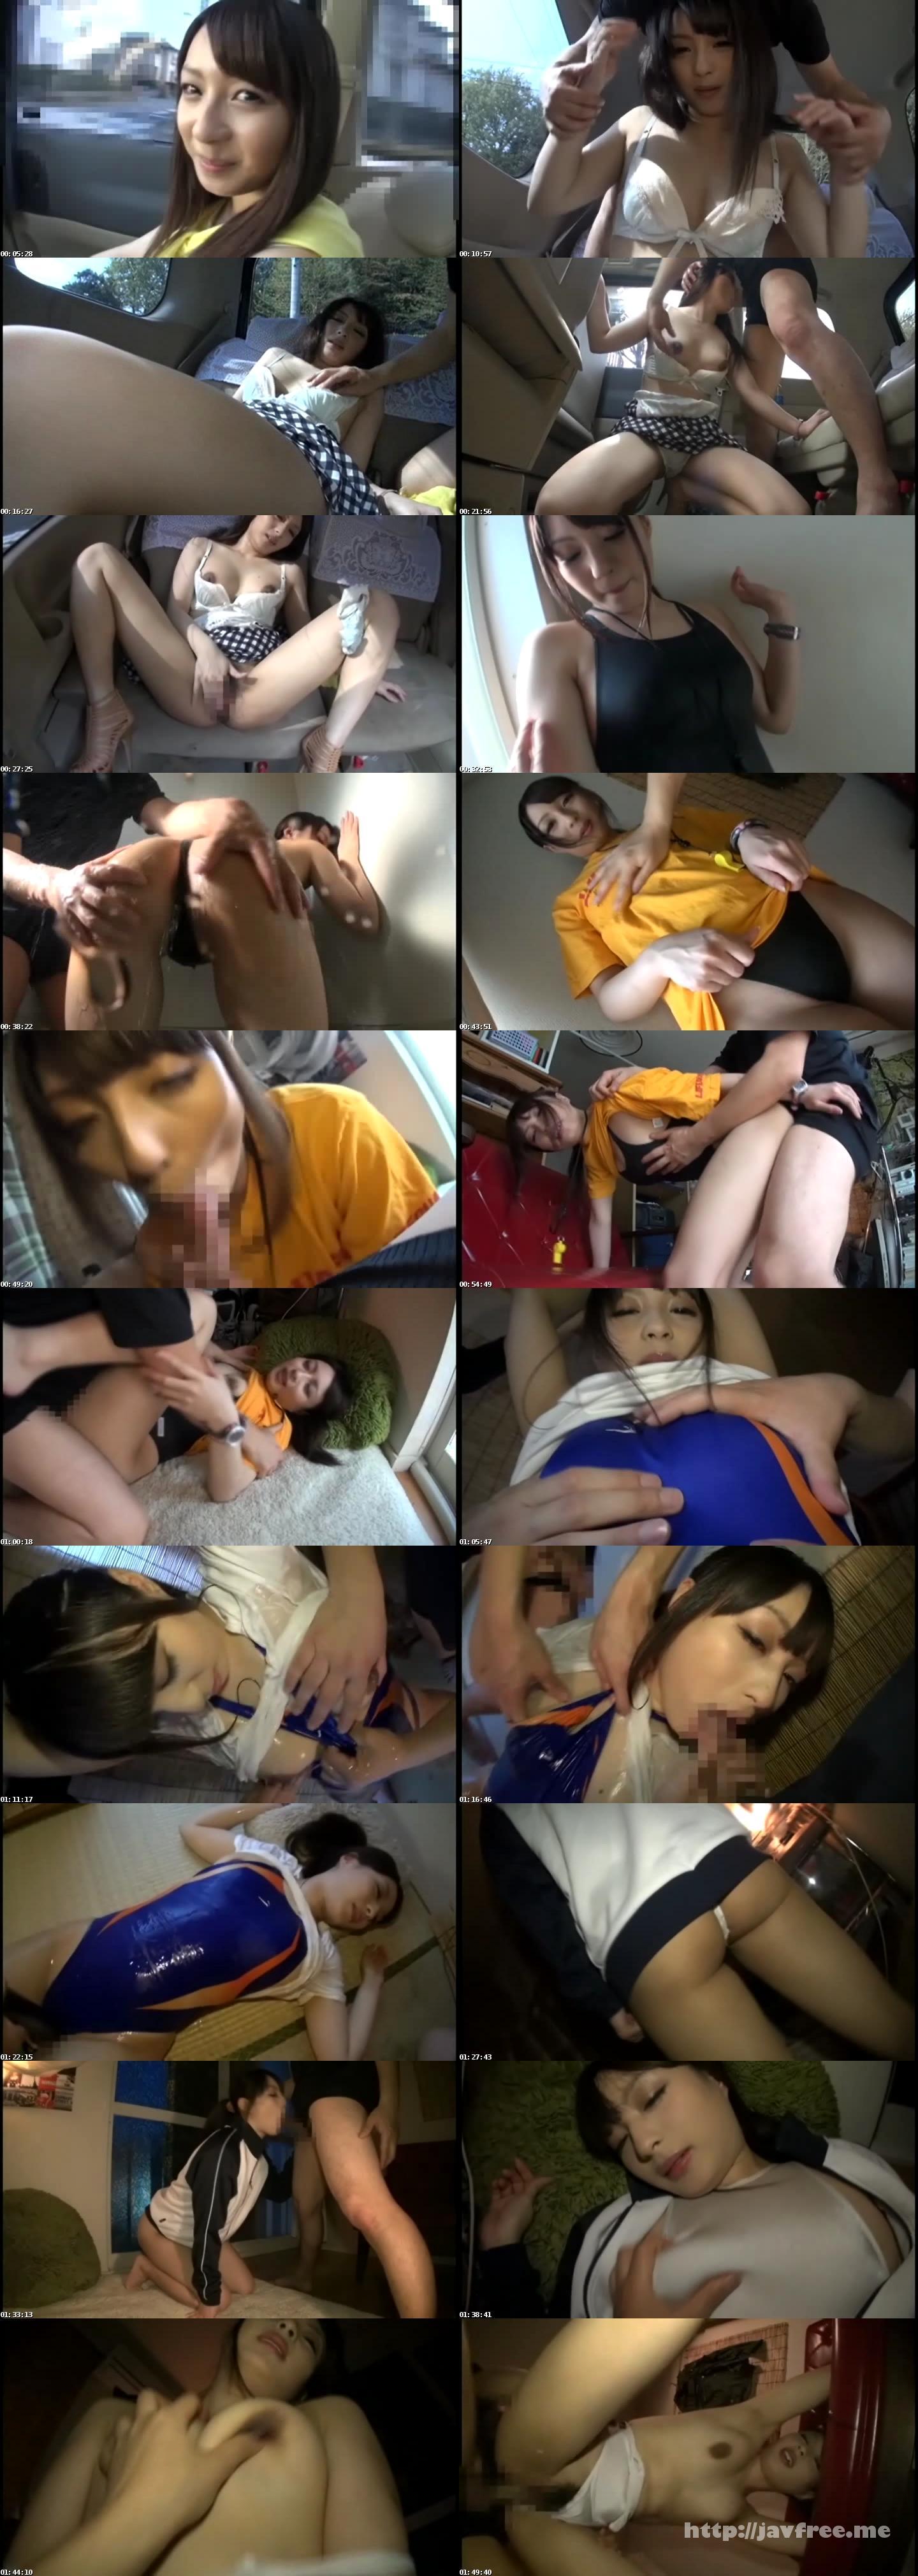 [DSSA-001] プール監視員バイトの学生がAV出演 小野まどか - image DSSA-001 on https://javfree.me